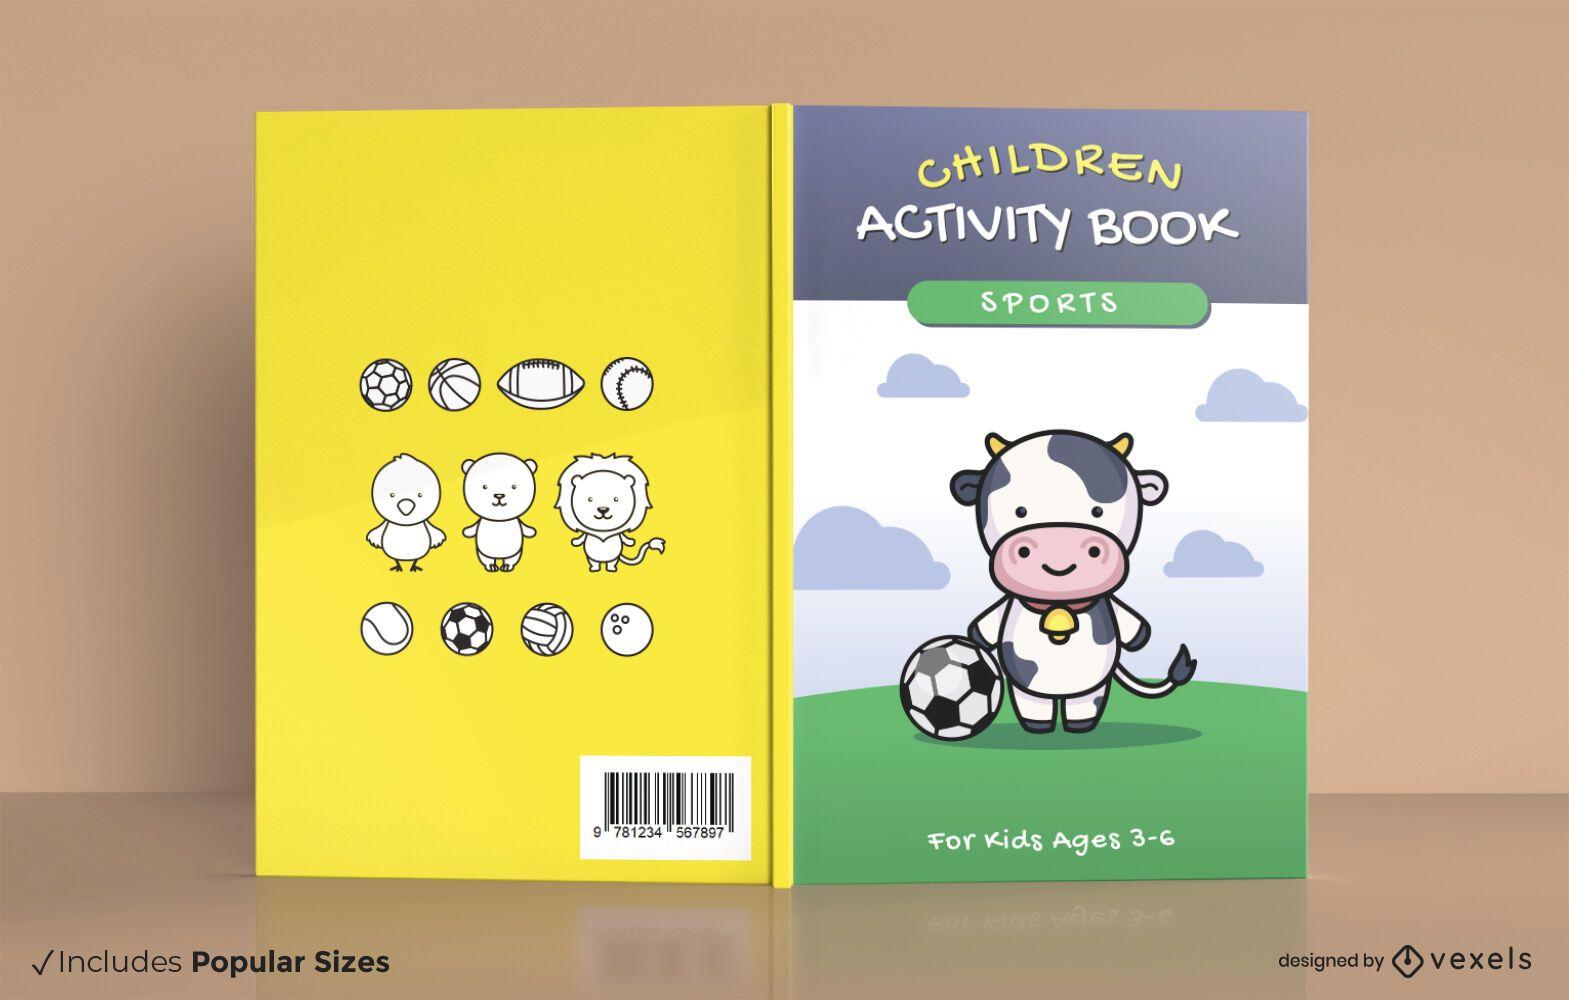 Children sports activity book cover design